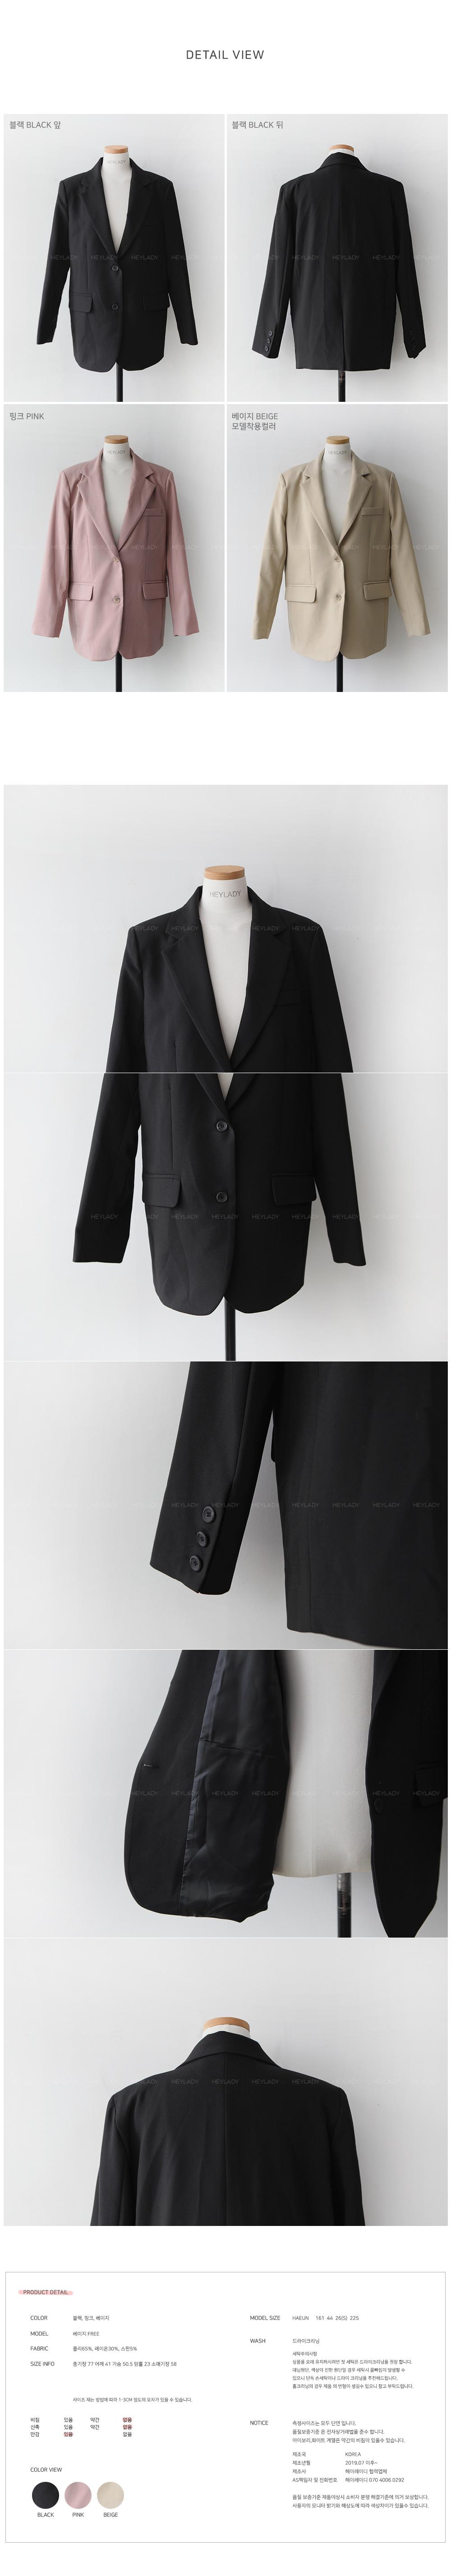 Broman's Single Jacket